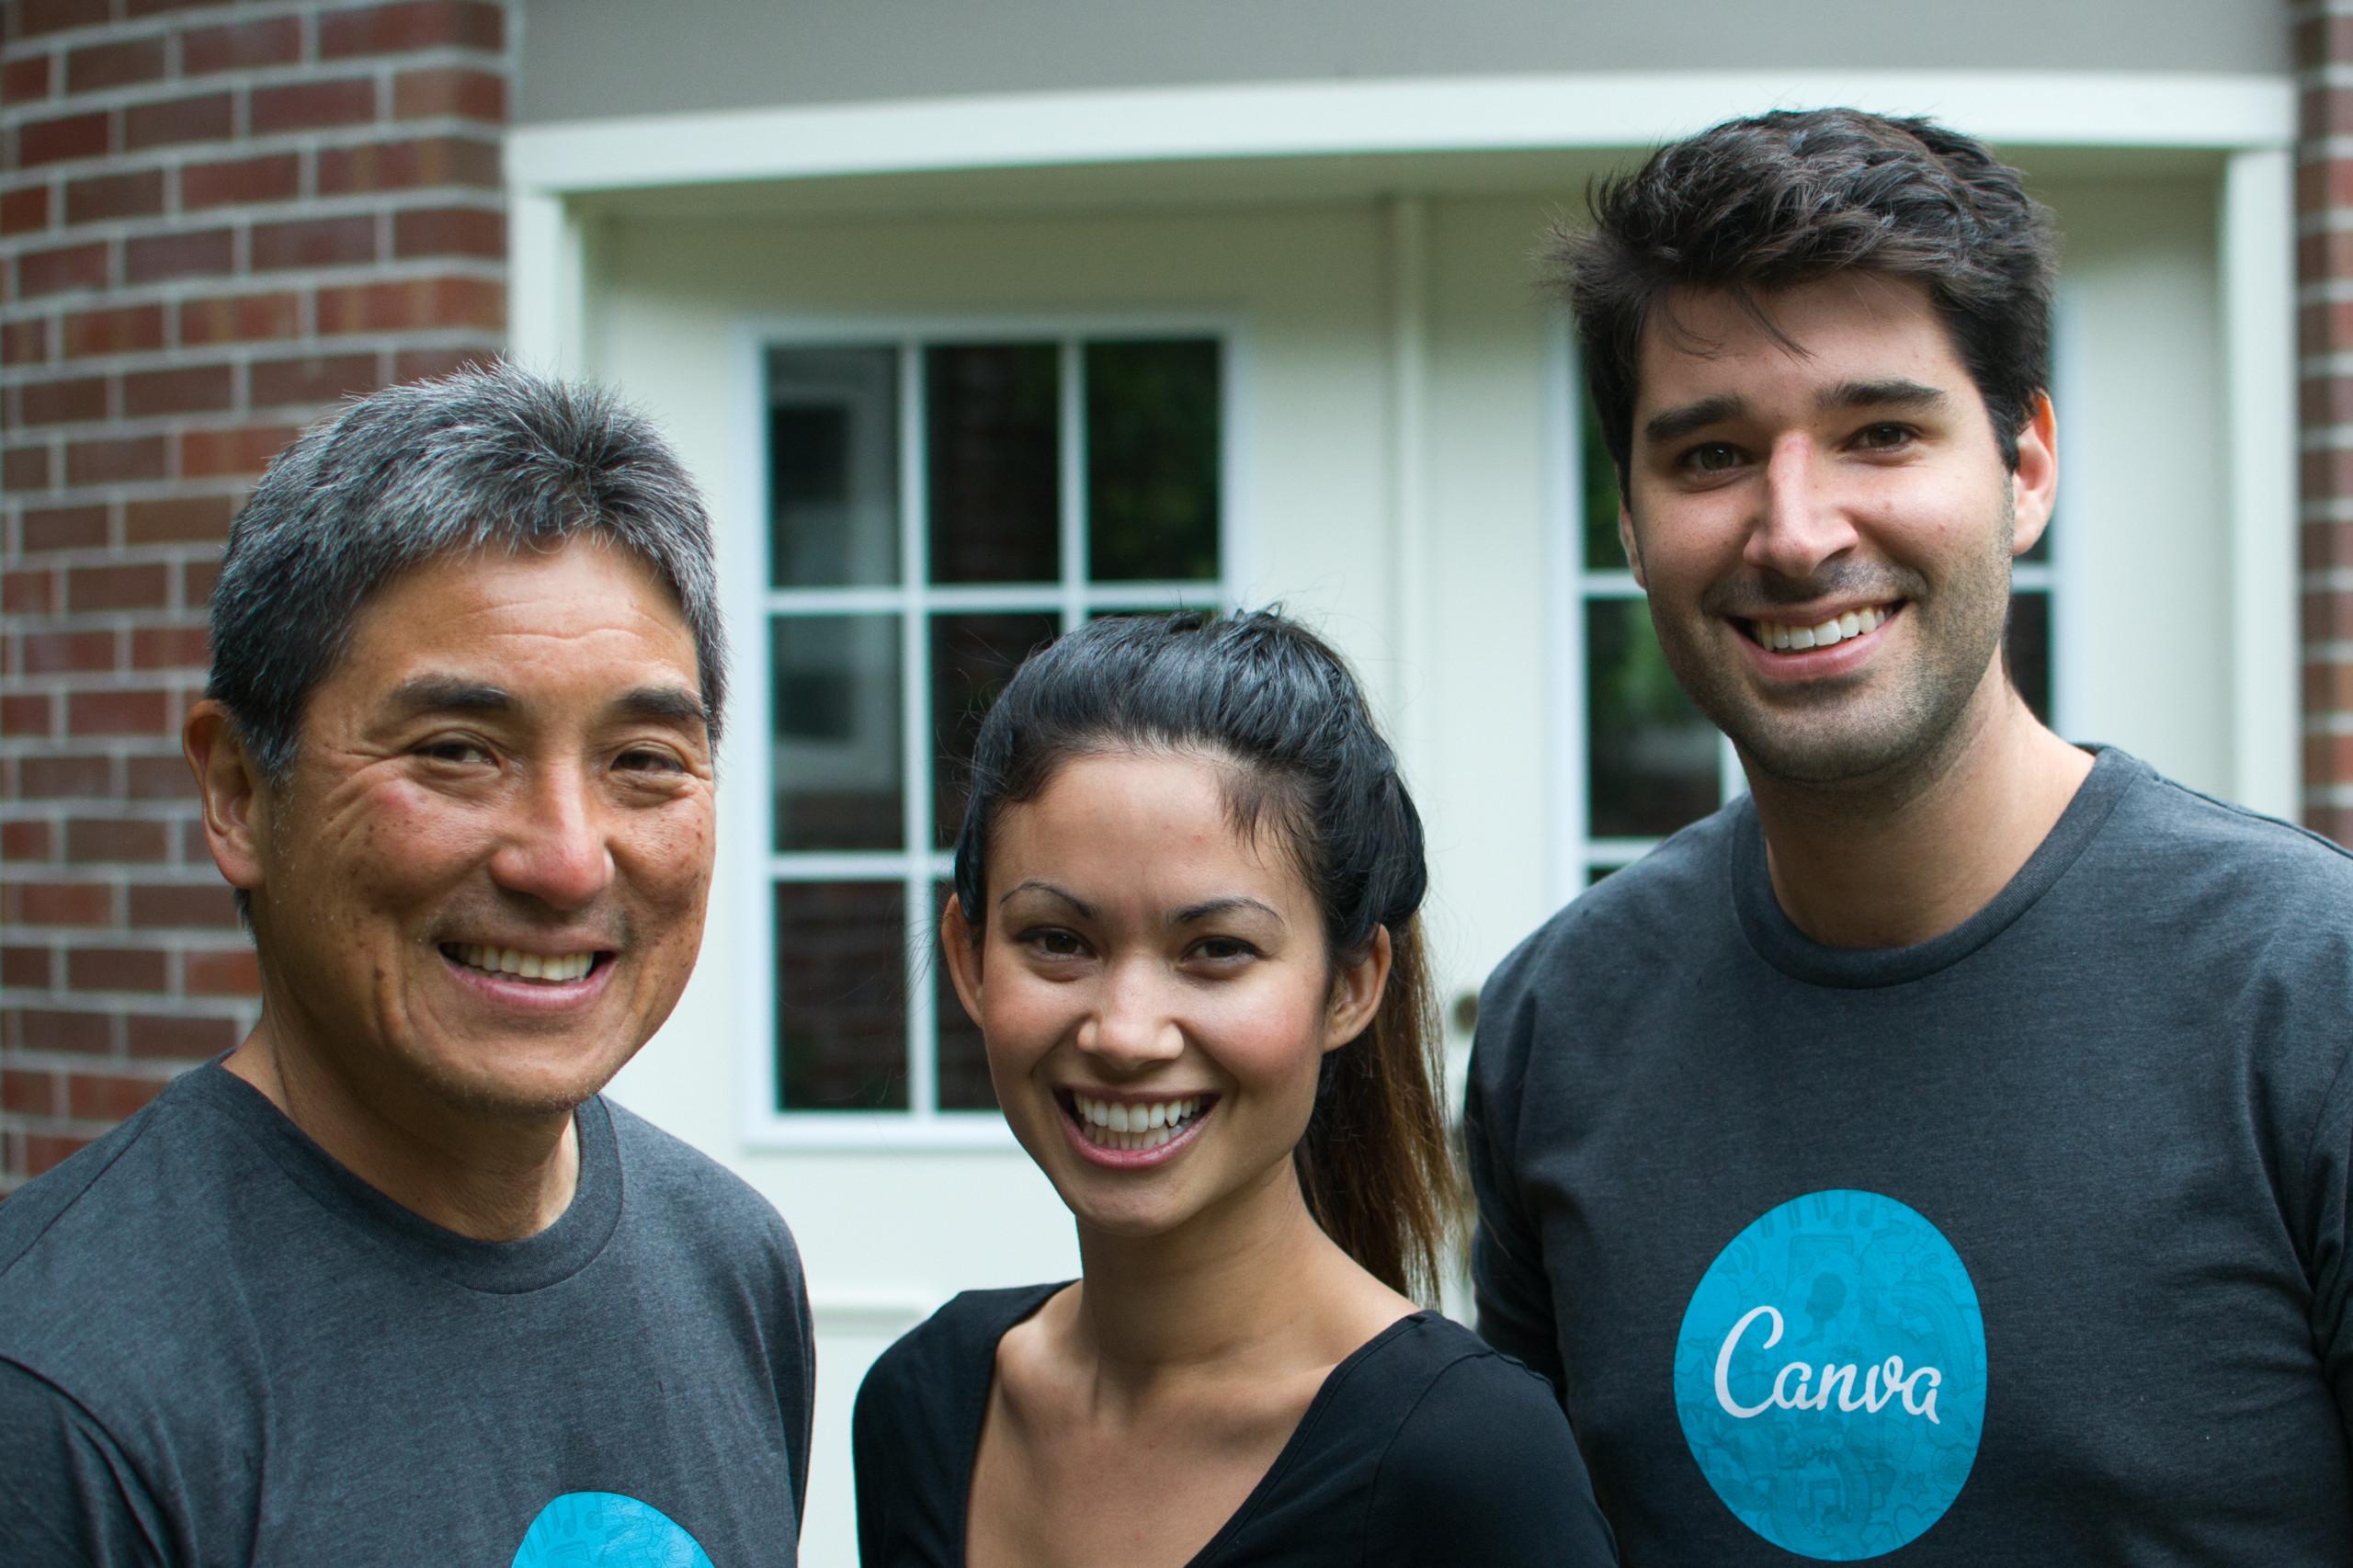 Canva team with Guy Kawasaki